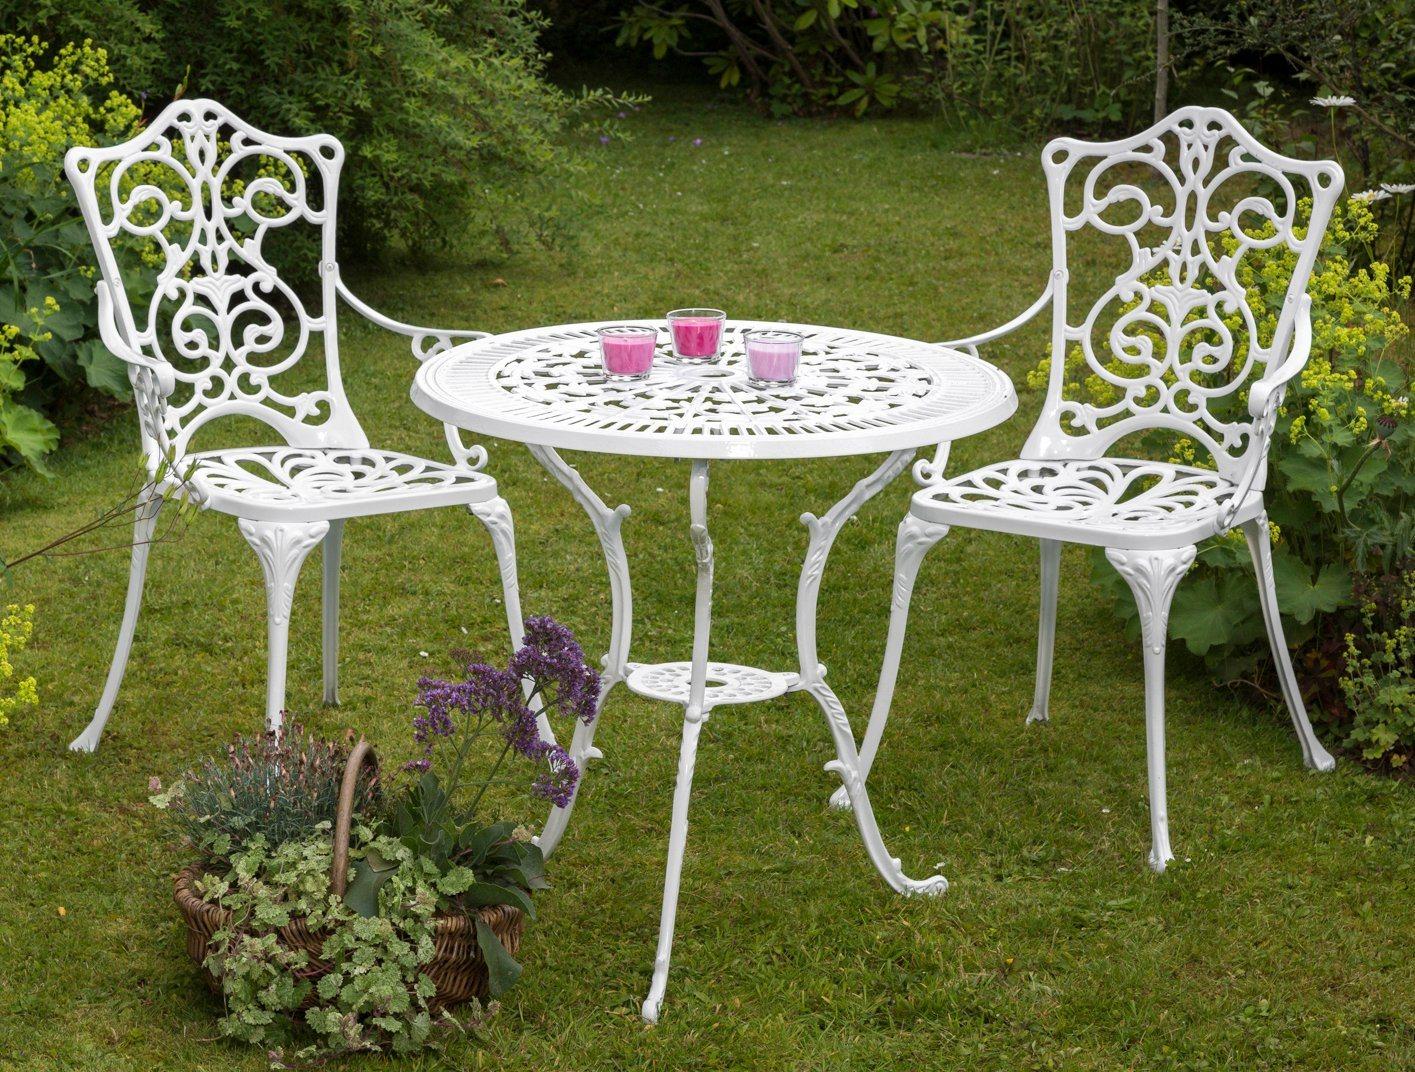 Gartenmöbelset »Lugano«, 3tlg., 2 Stühle, Tisch Ø 70, Aluminium